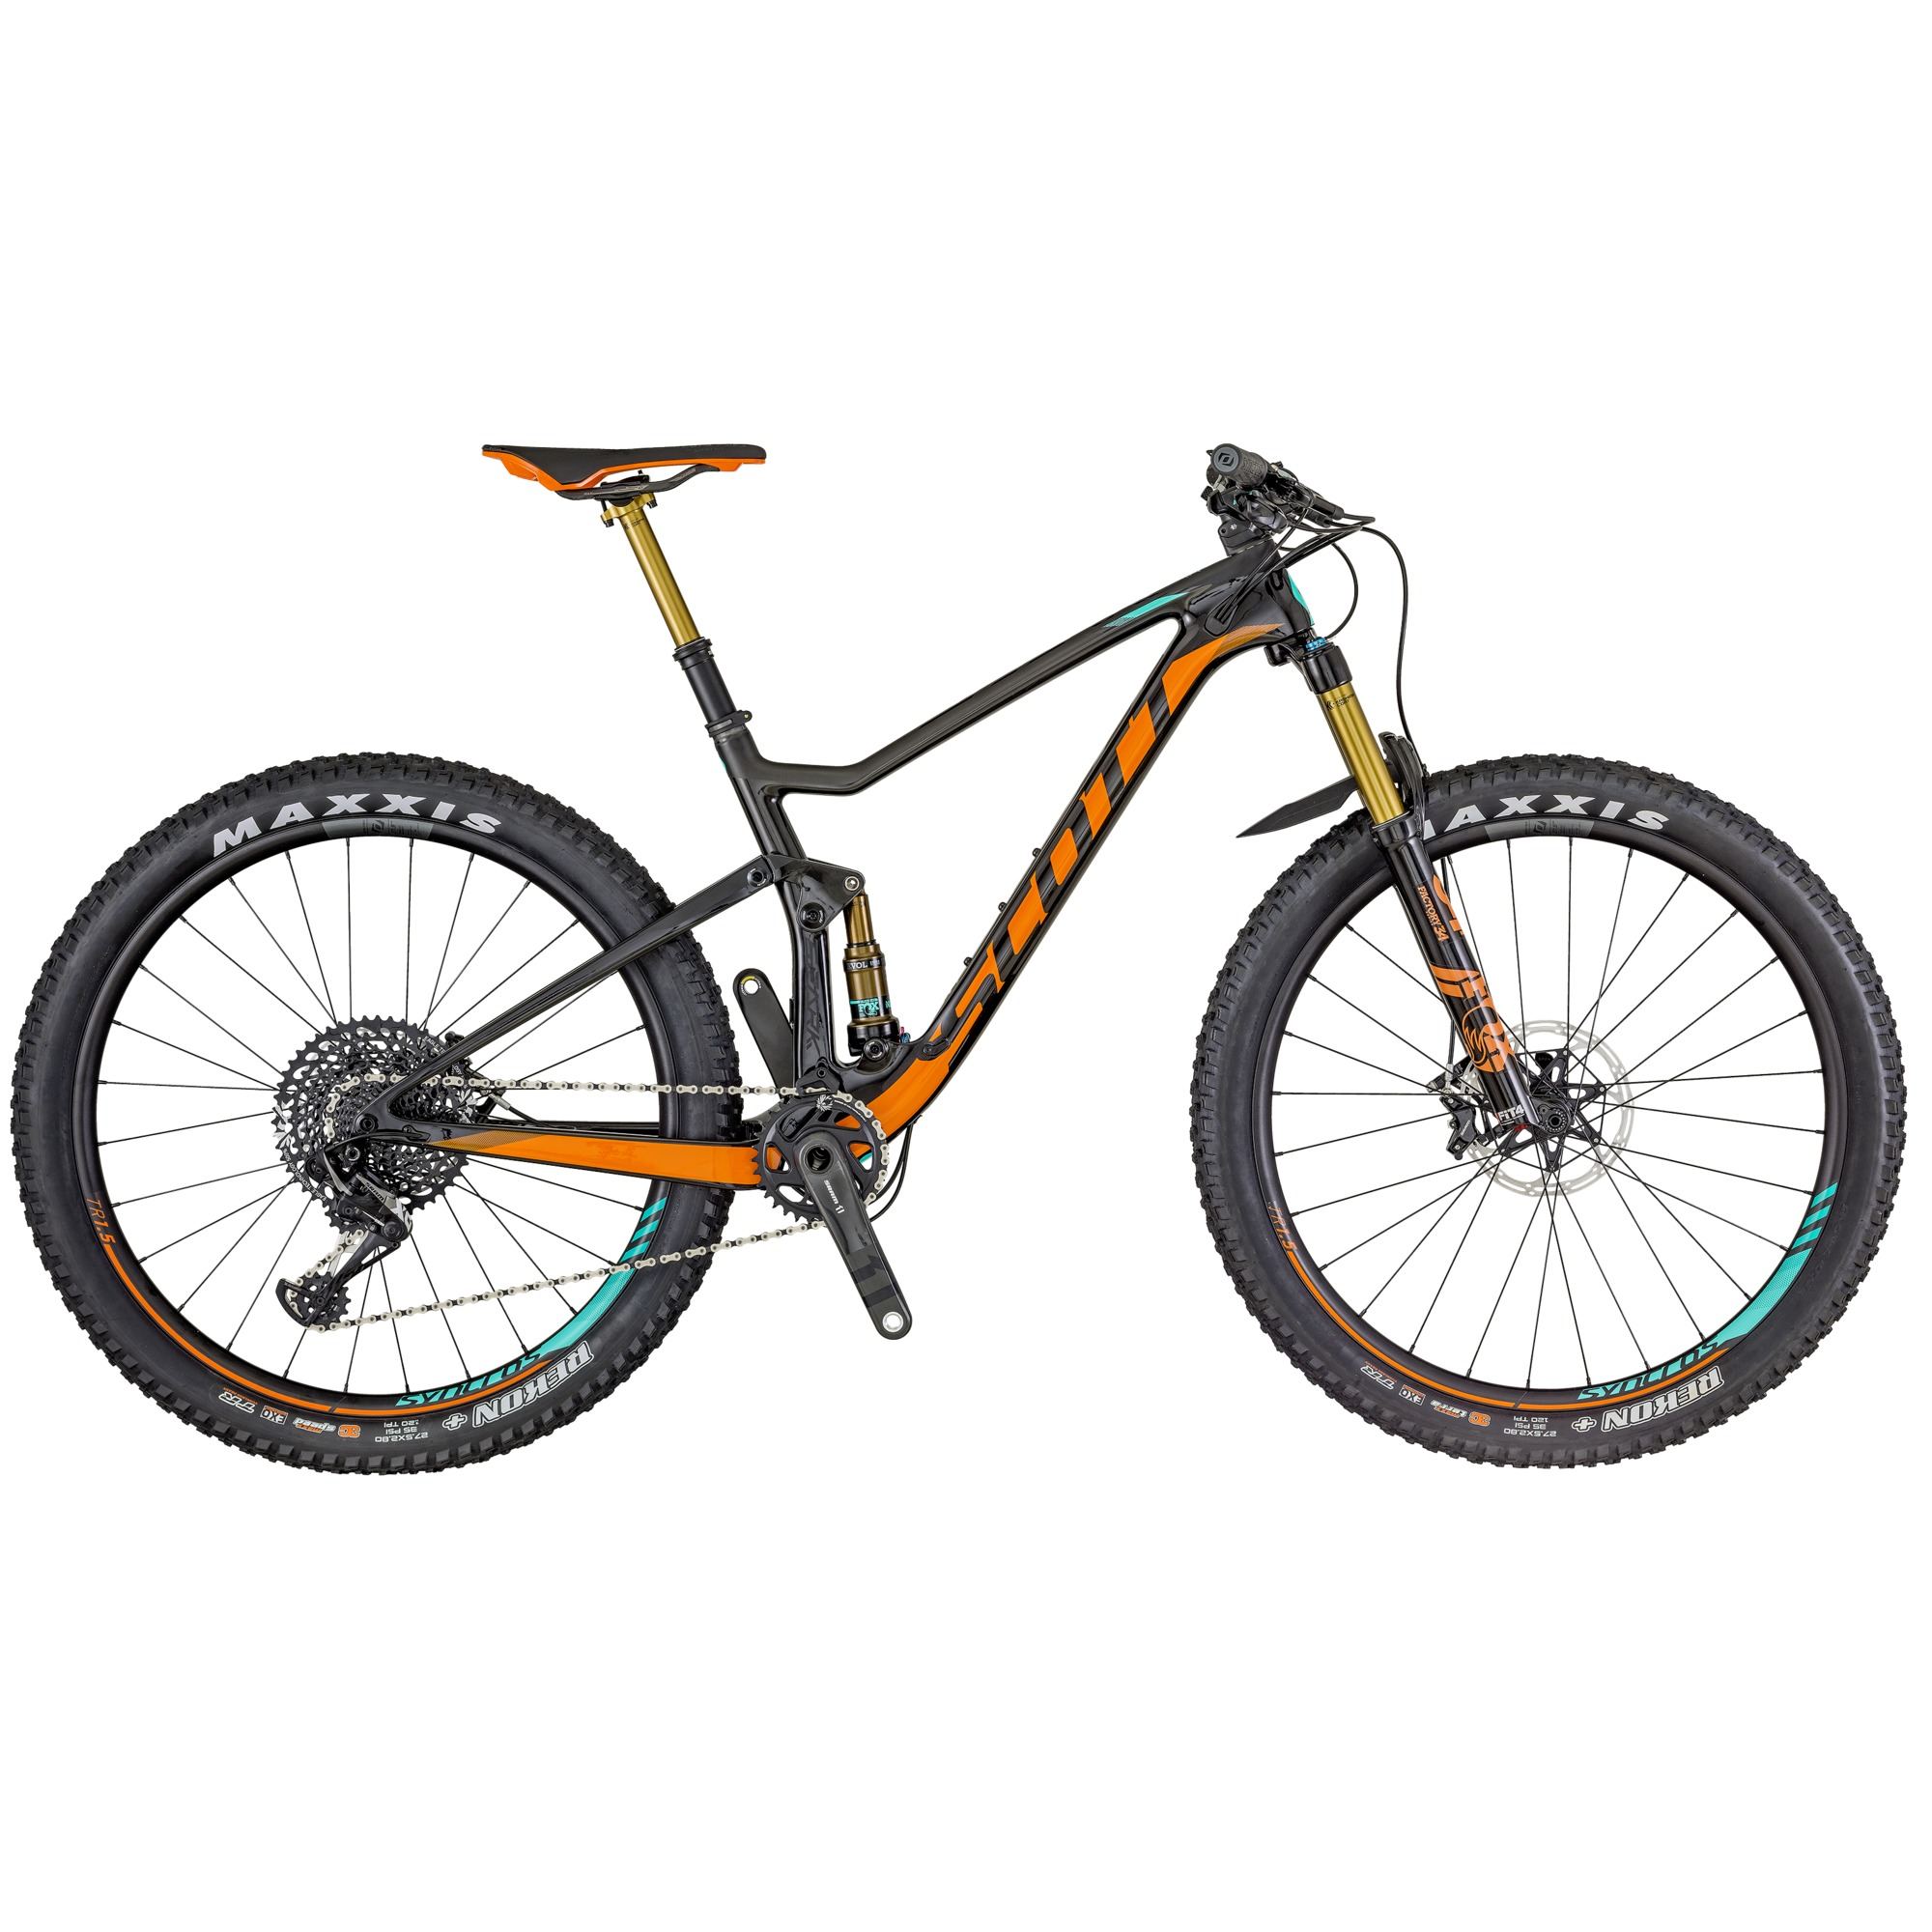 SCOTT Spark 700 Tuned Bike L - Zweirad Homann